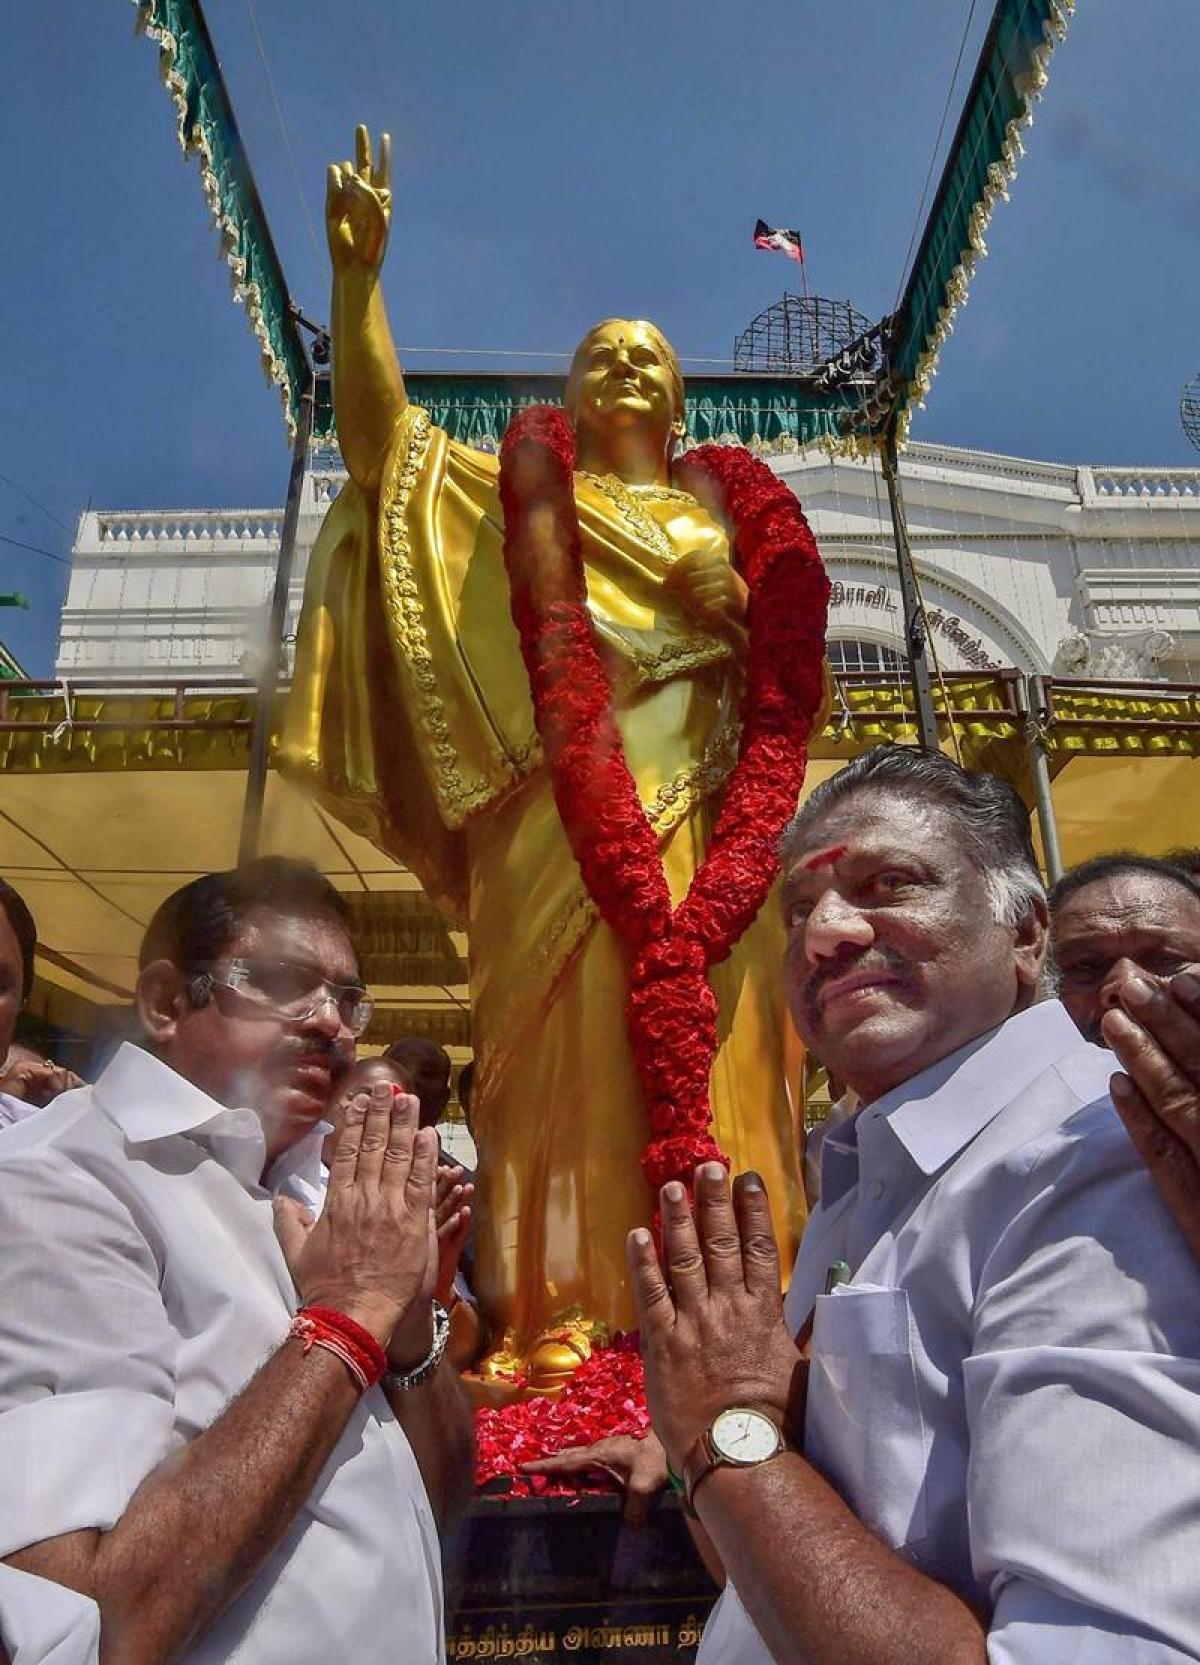 Jayalalithaa 70th birth anniversary: Former Tamil Nadu CM's statue unveiled at AIADMK headquarters